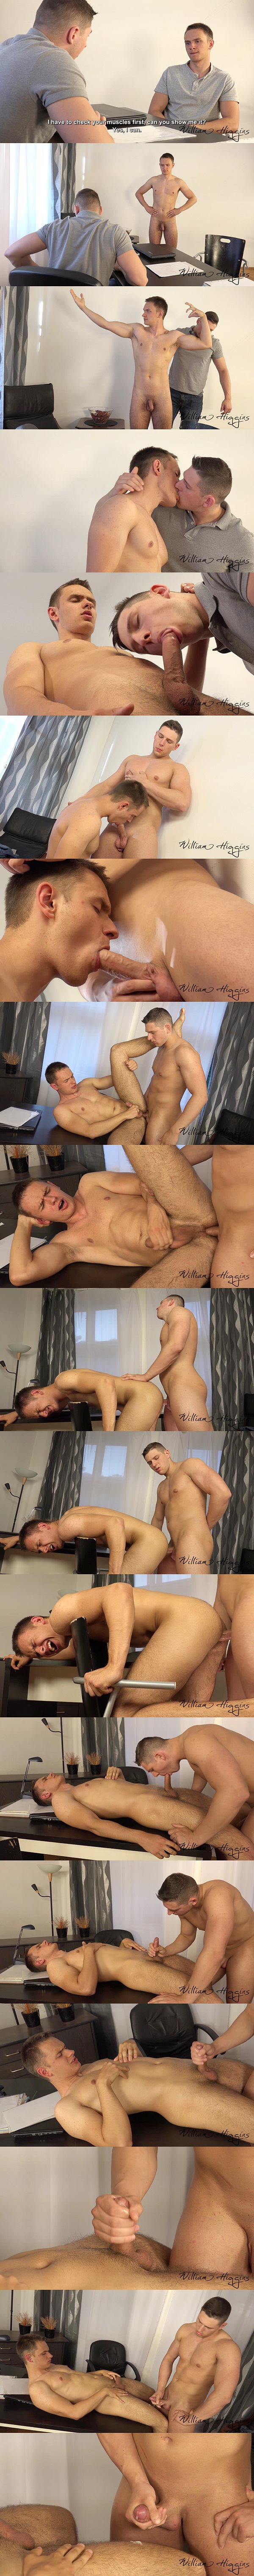 Aron Ros barebacks hot new jock Michal Dolezal's tight virgin ass at Williamhiggins 02